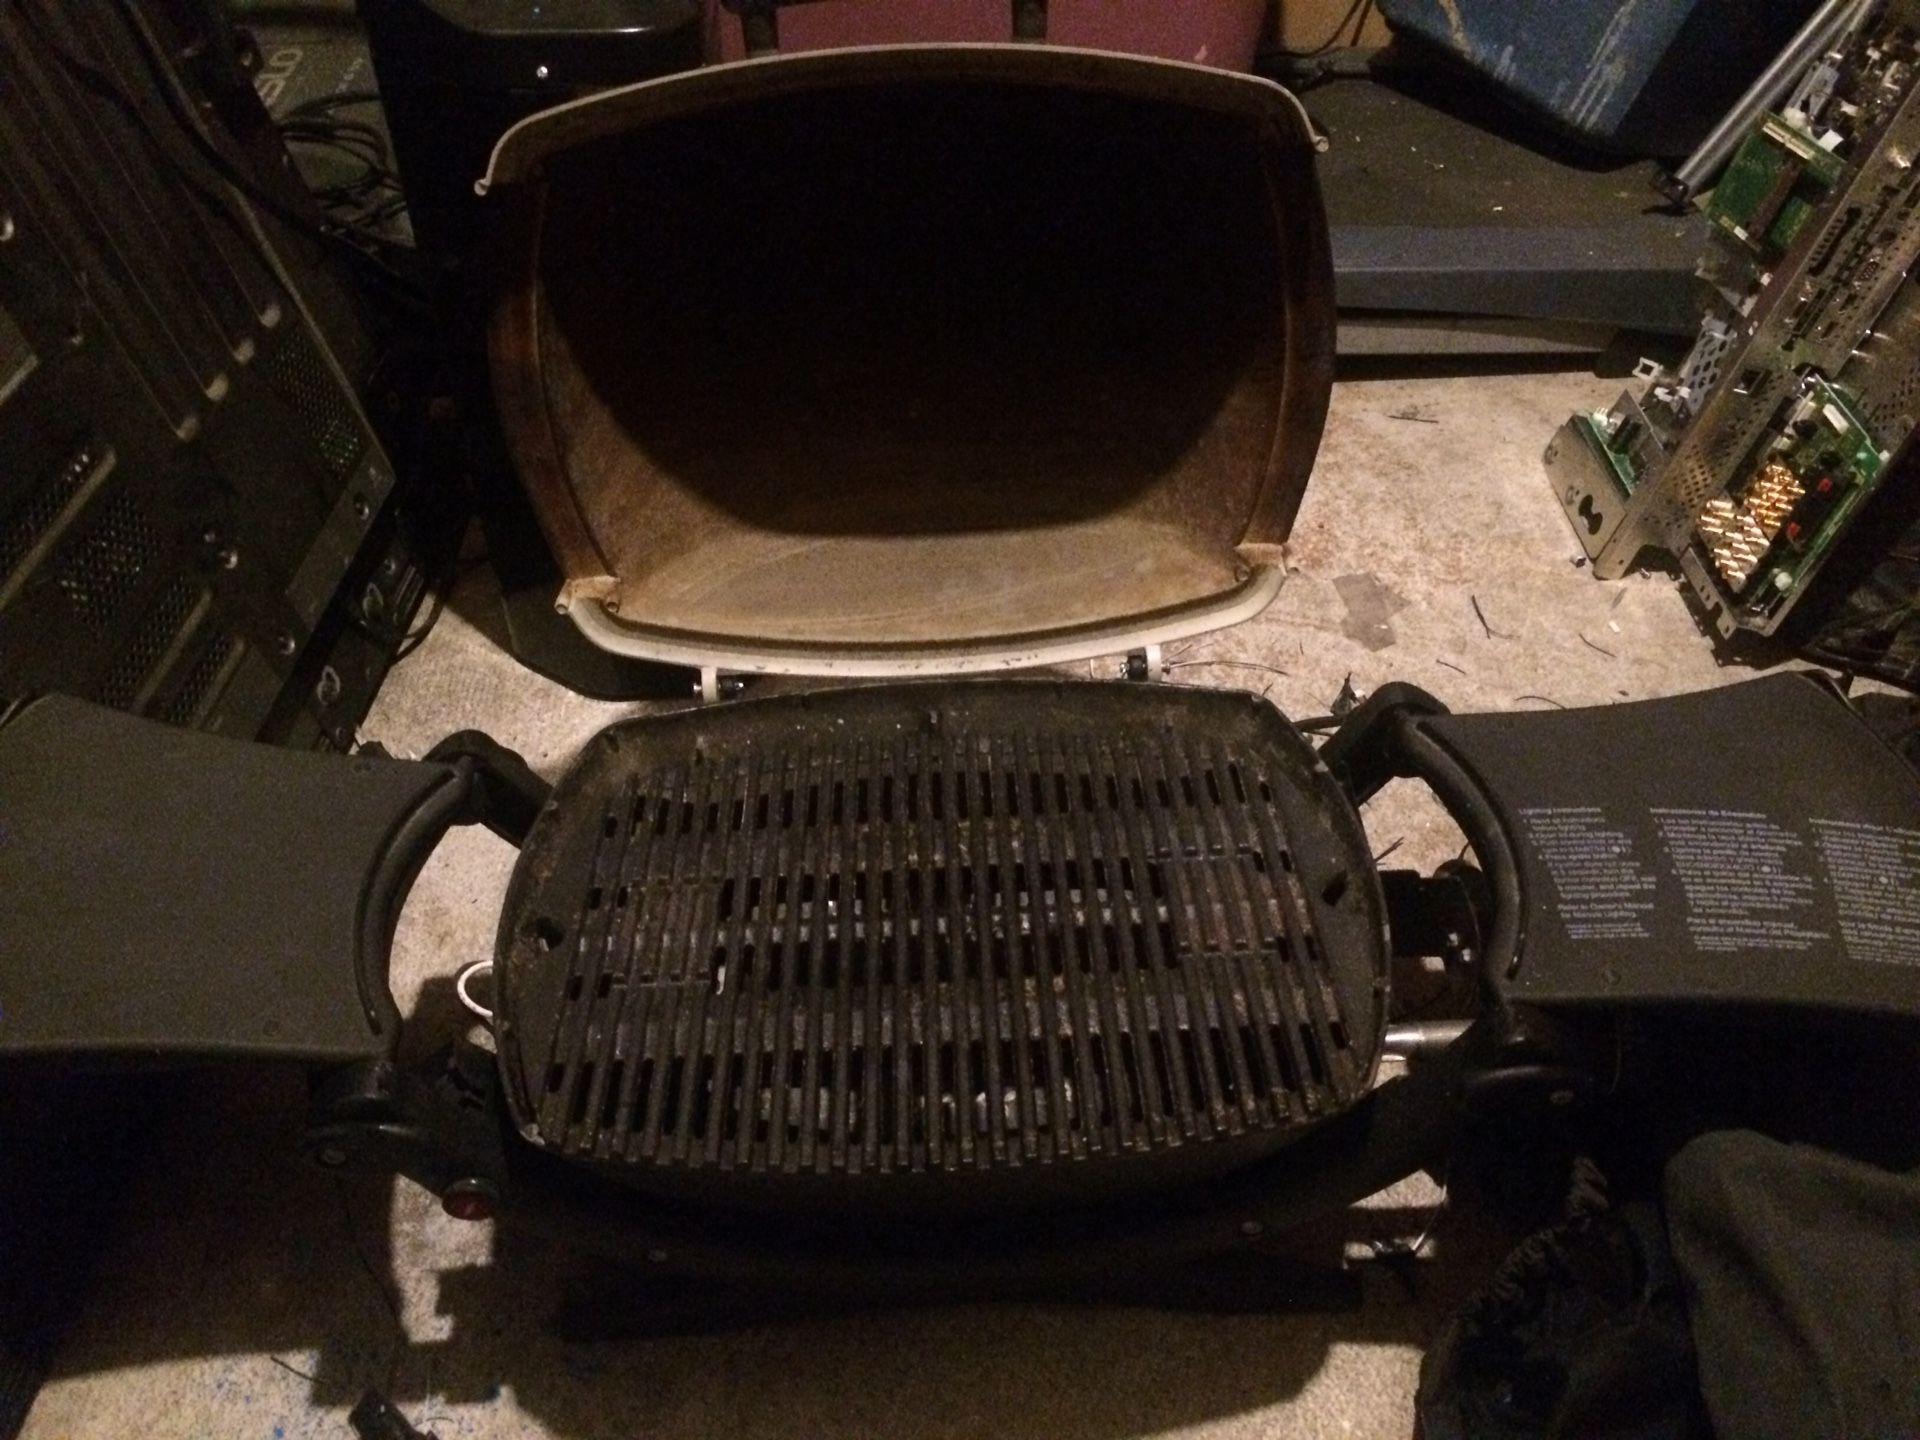 Compact portable barbecue